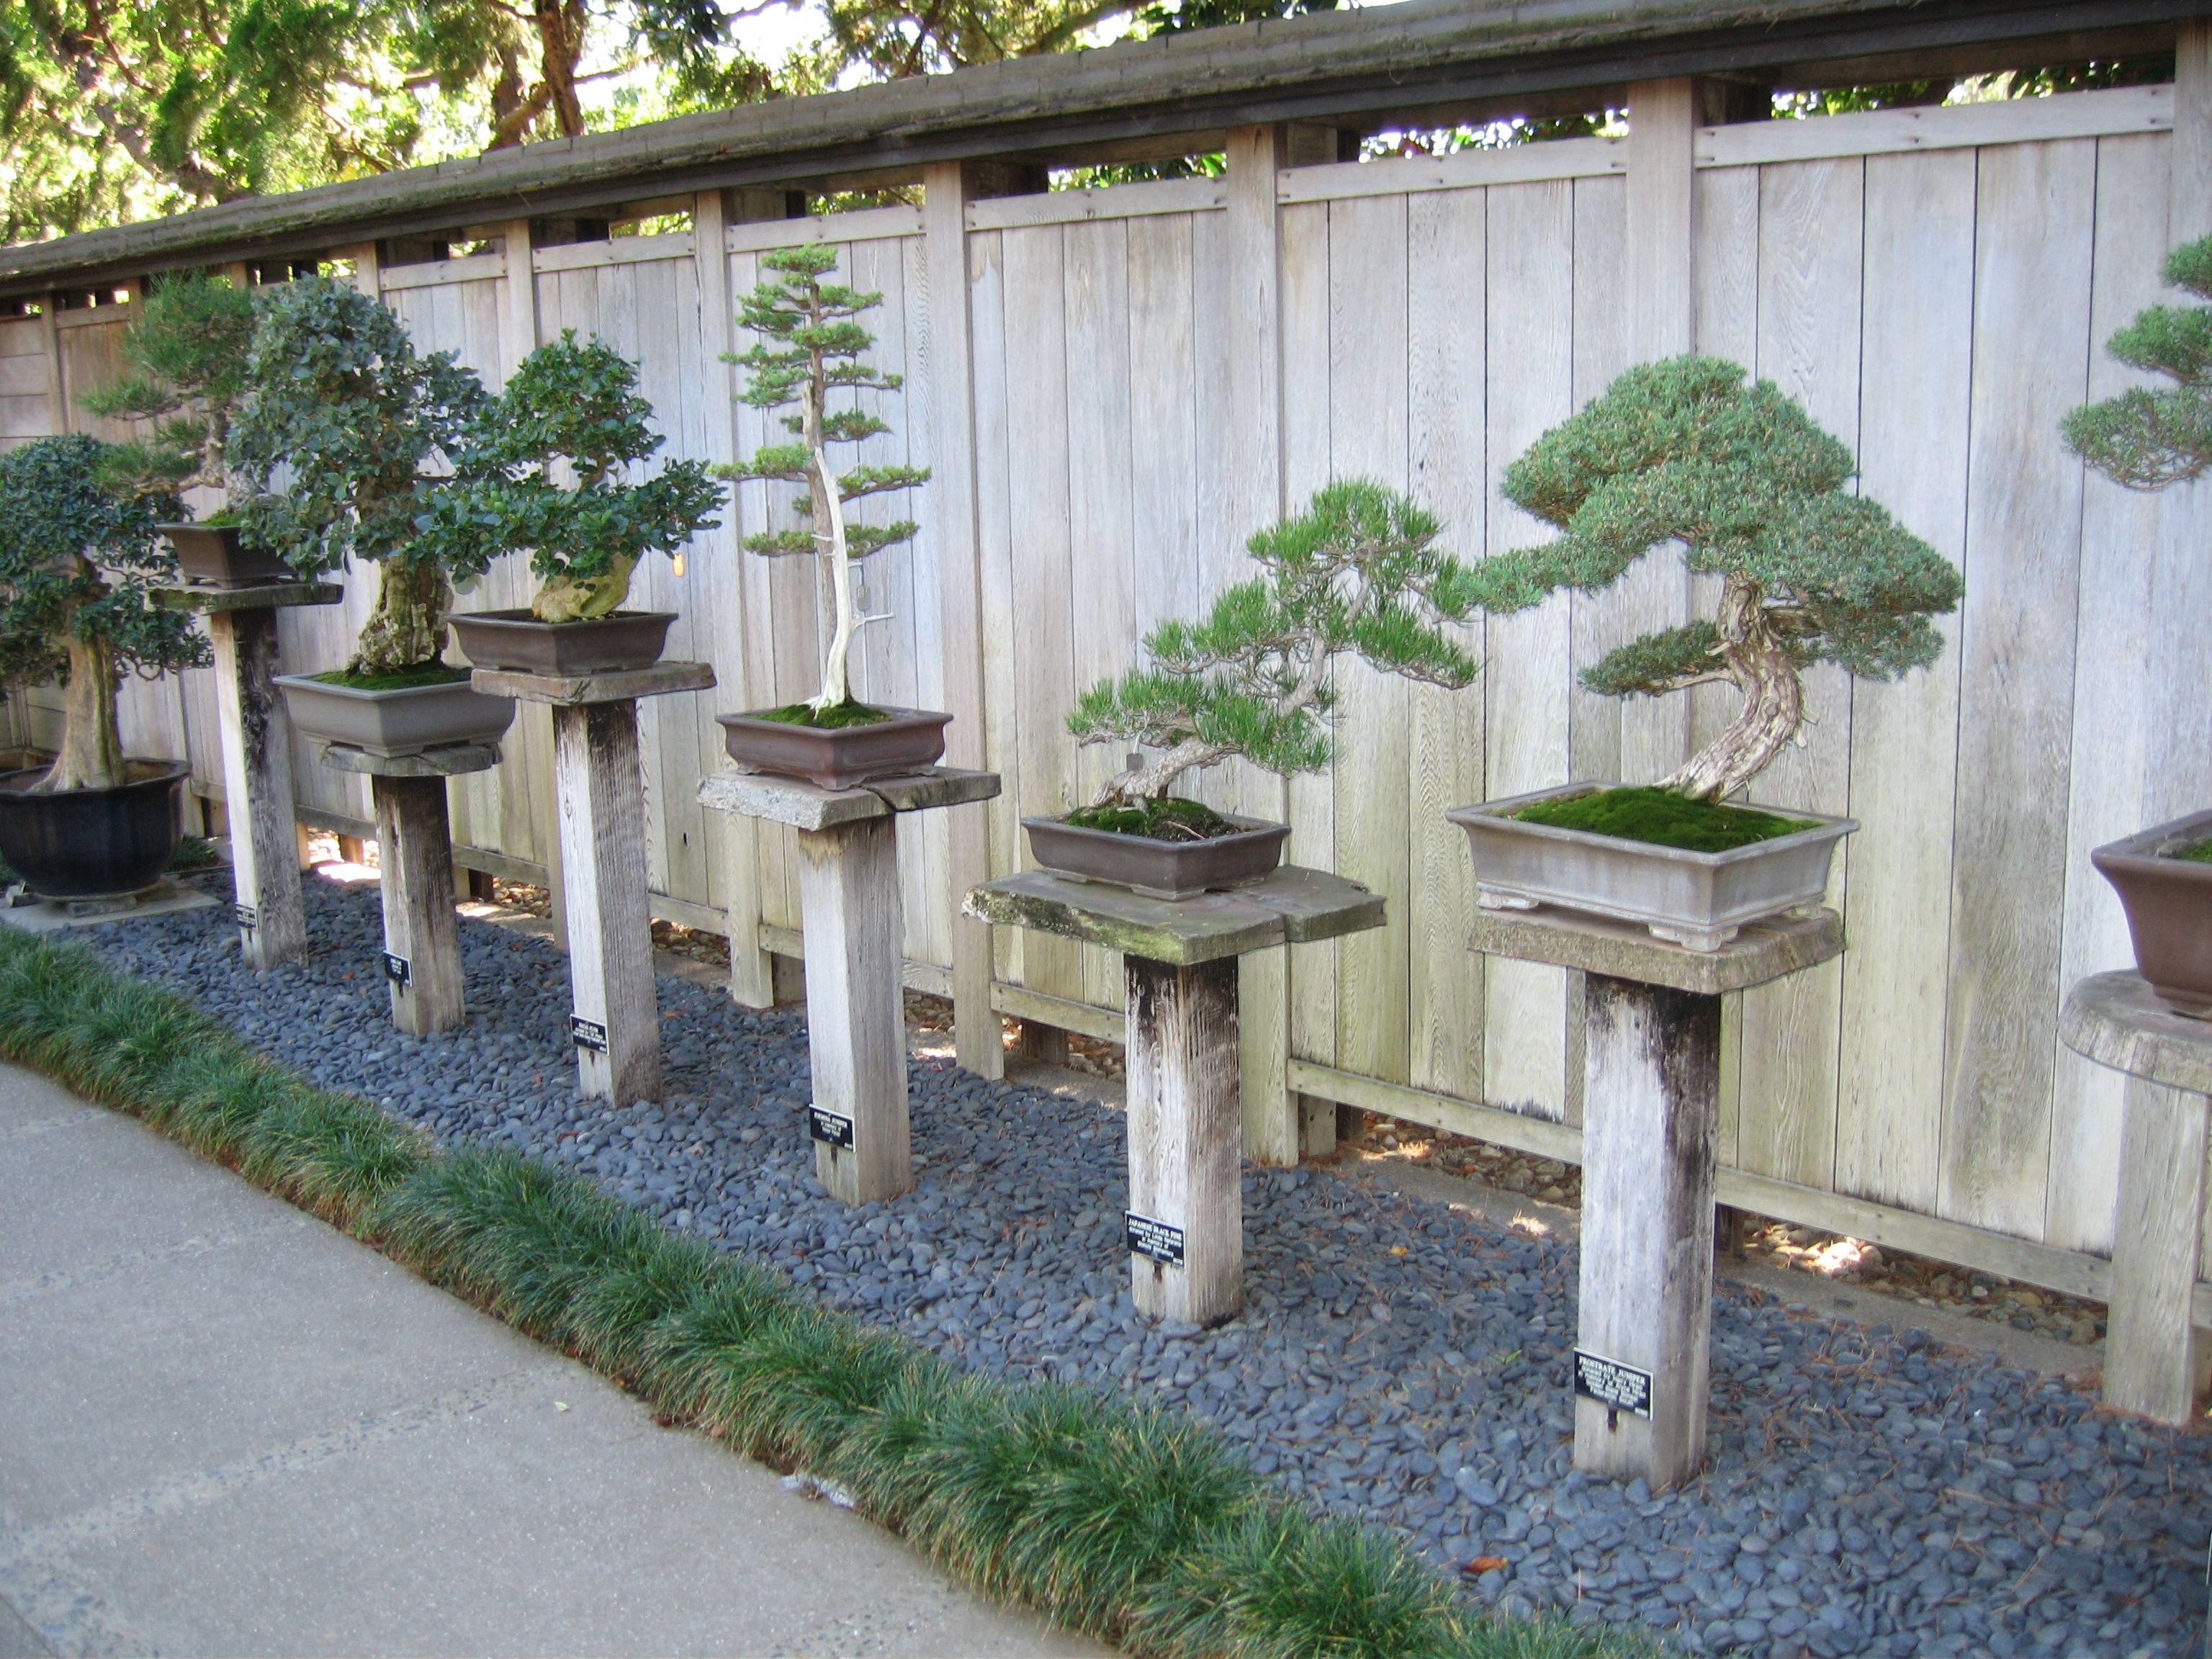 Botanical gardens oahu cing garden ftempo for Garden state orthopedics fair lawn